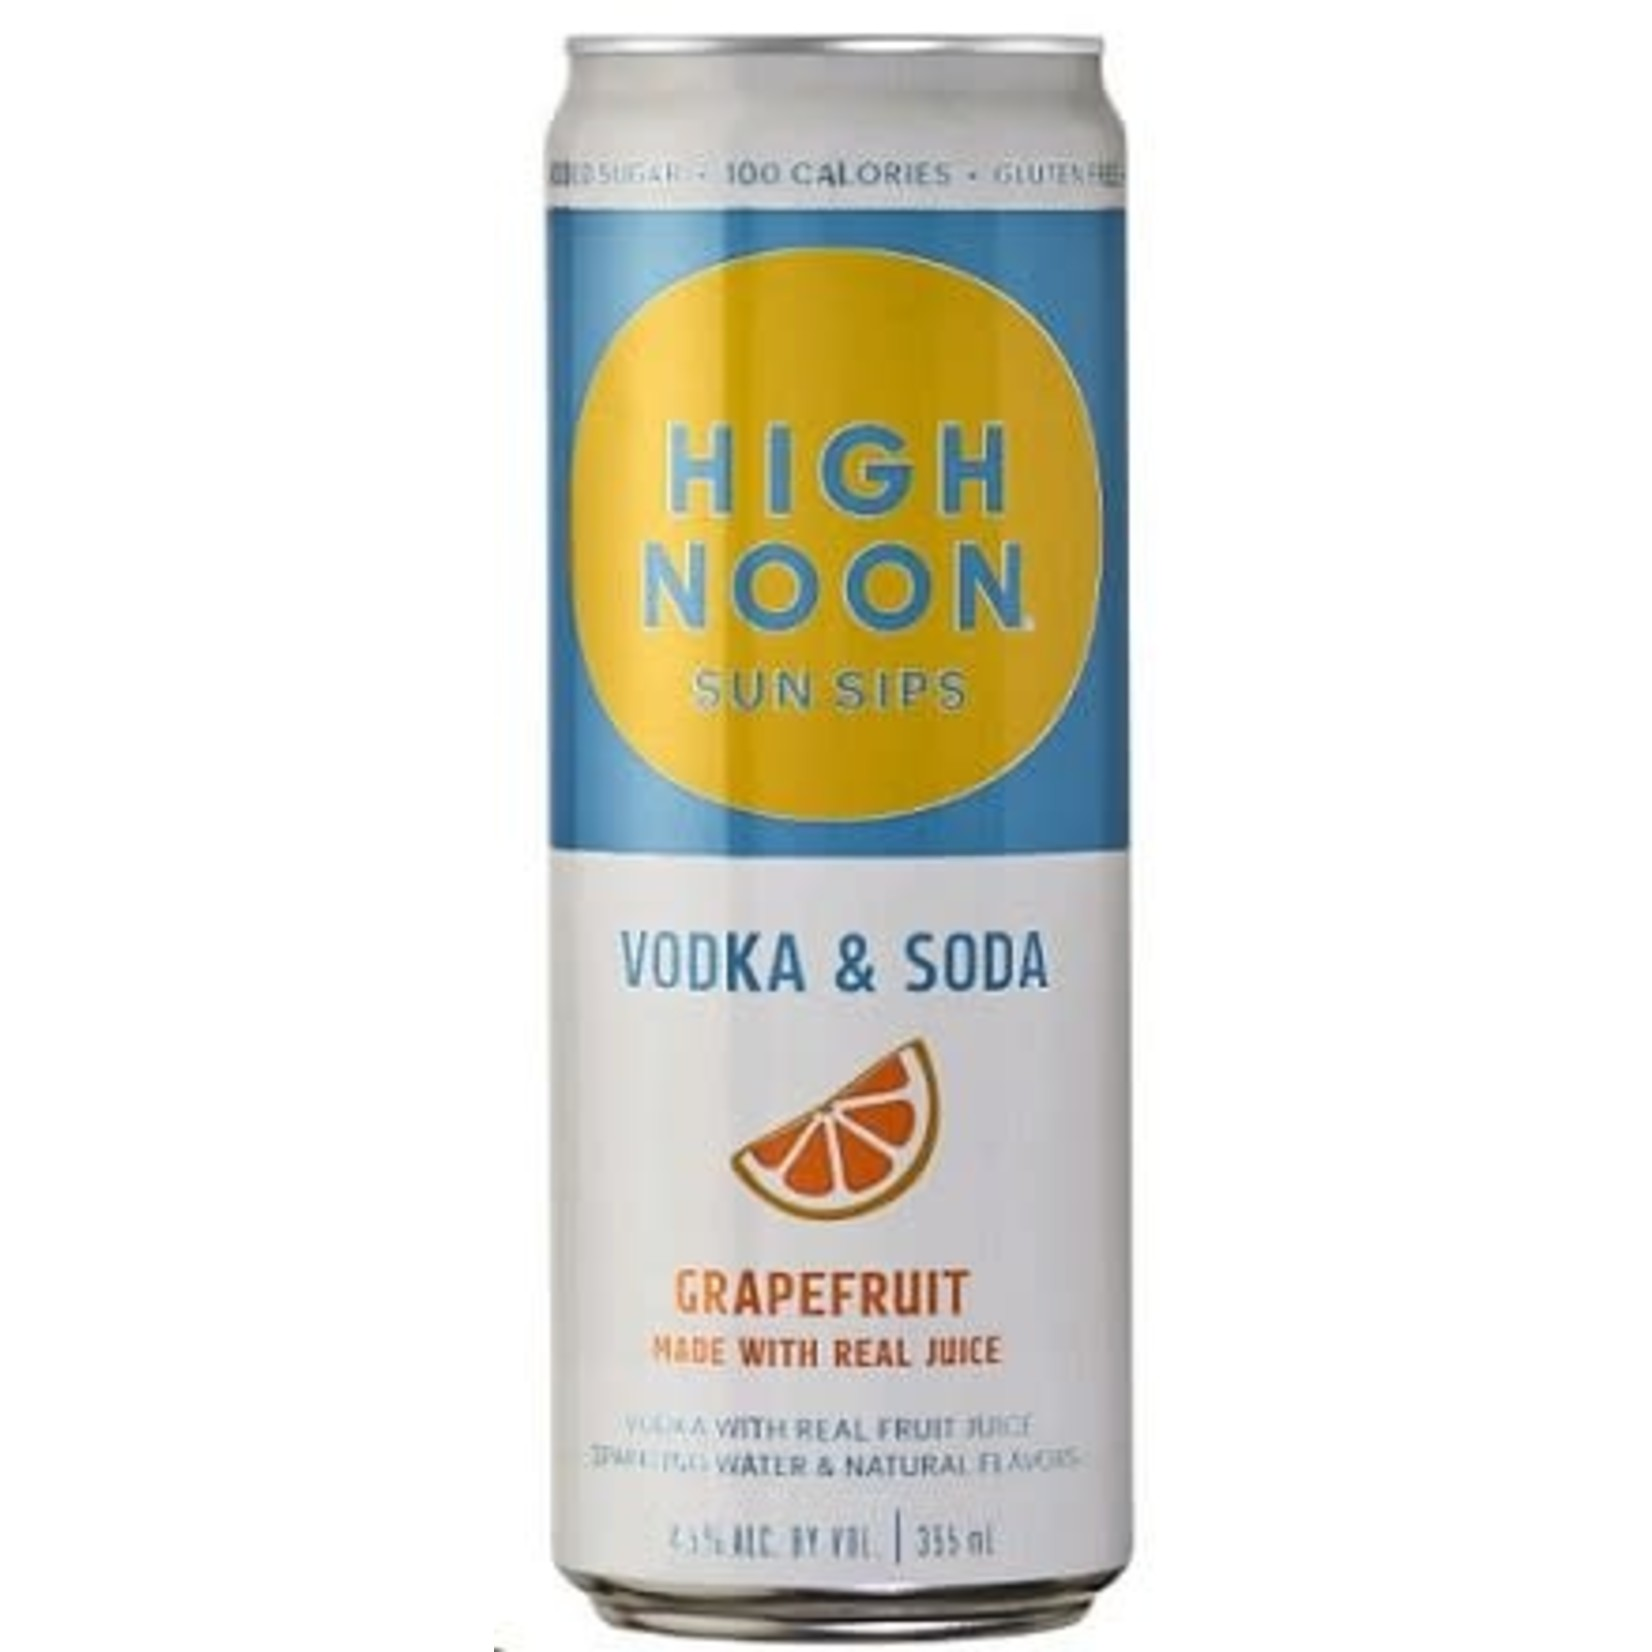 Spirits High Noon Sun Sips Vodka & Soda Grapefruit 355ml Cans